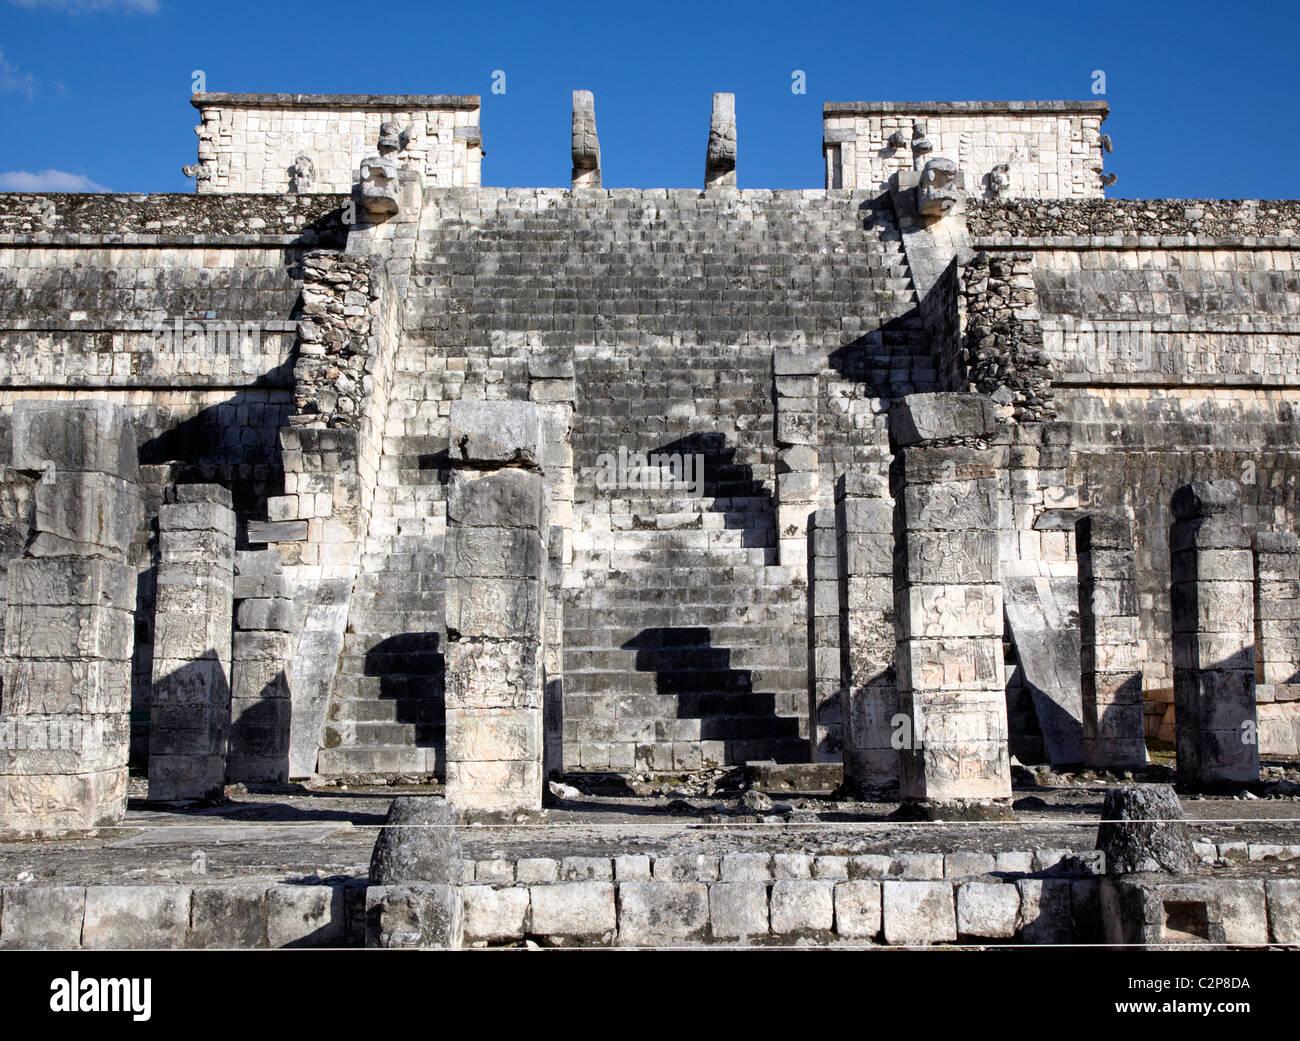 Temple At Chichen Itza Mayan Ruins Mexico - Stock Image